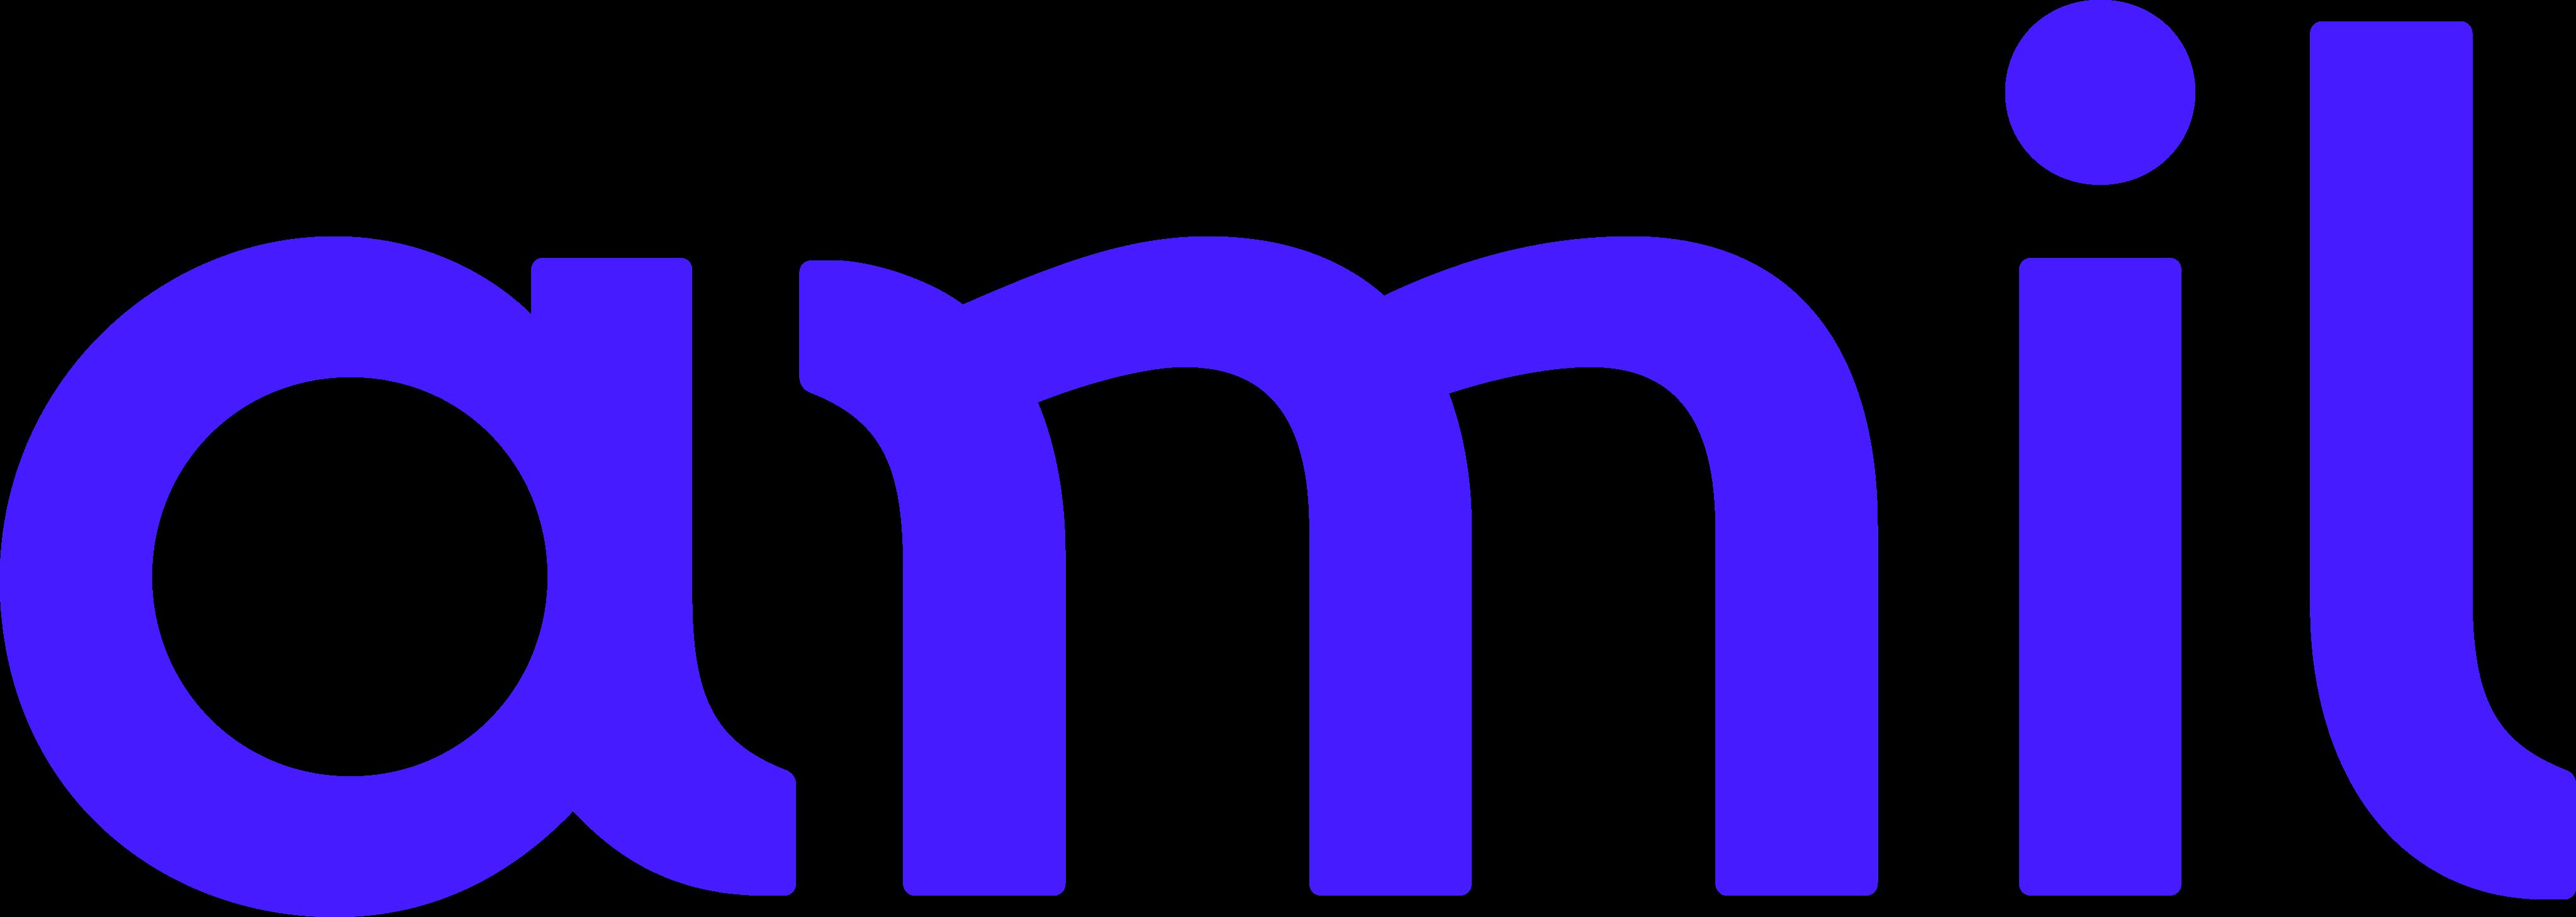 amil logo 1 2 - Amil Logo